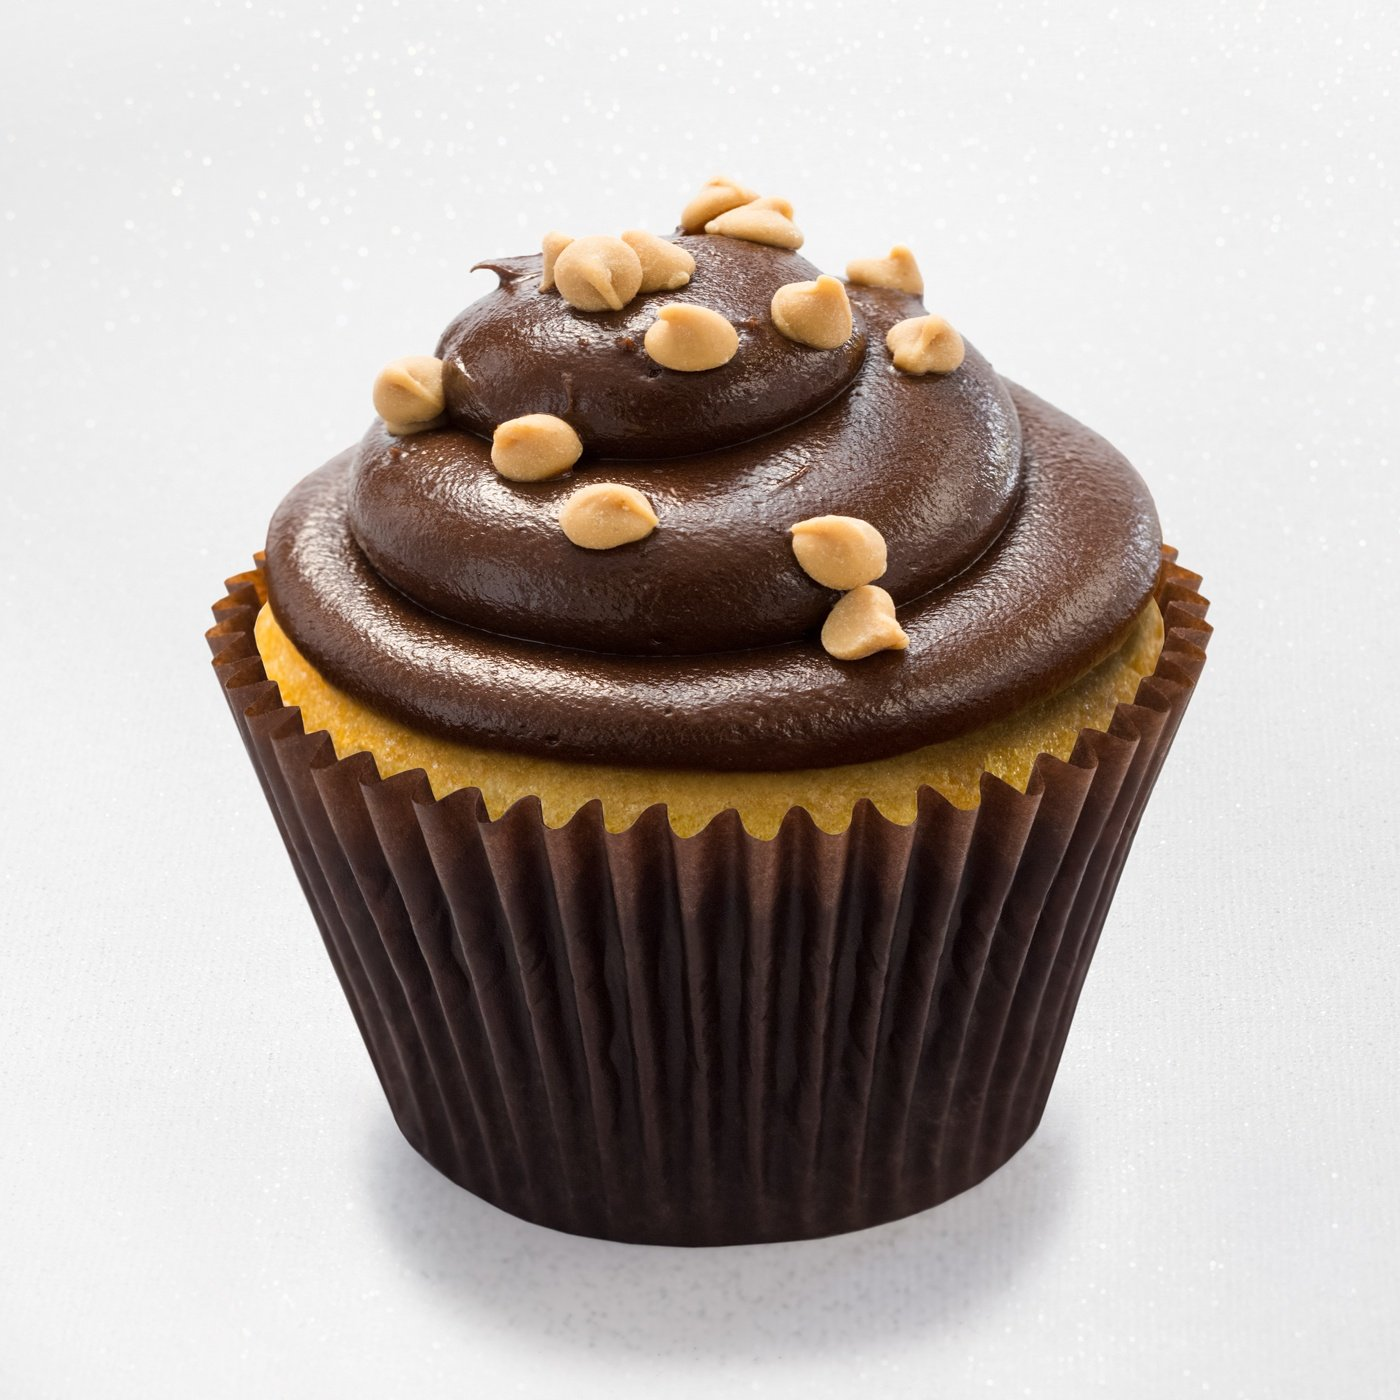 Peanut butter cupcake with dark chocolate fudge